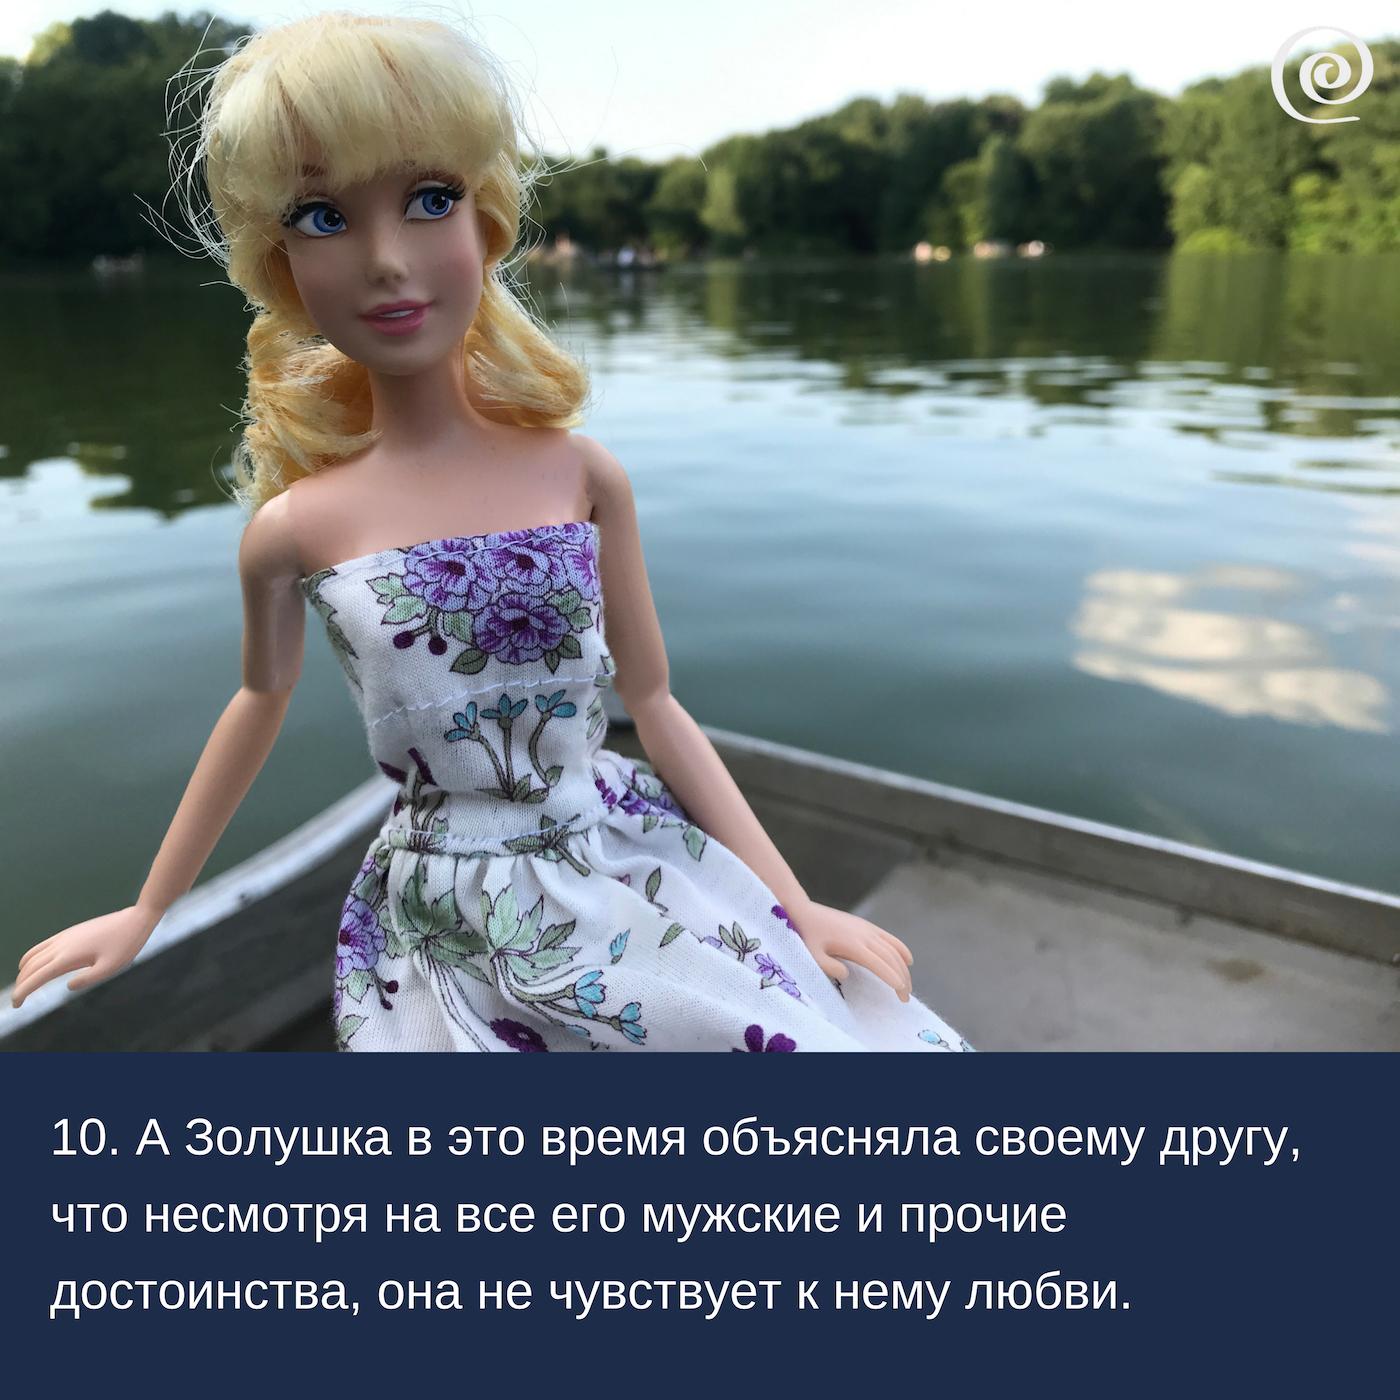 Фотосериал Разморозка. Сезон 8. Серия 4. Френдзона белоснежки. Эпизод 10